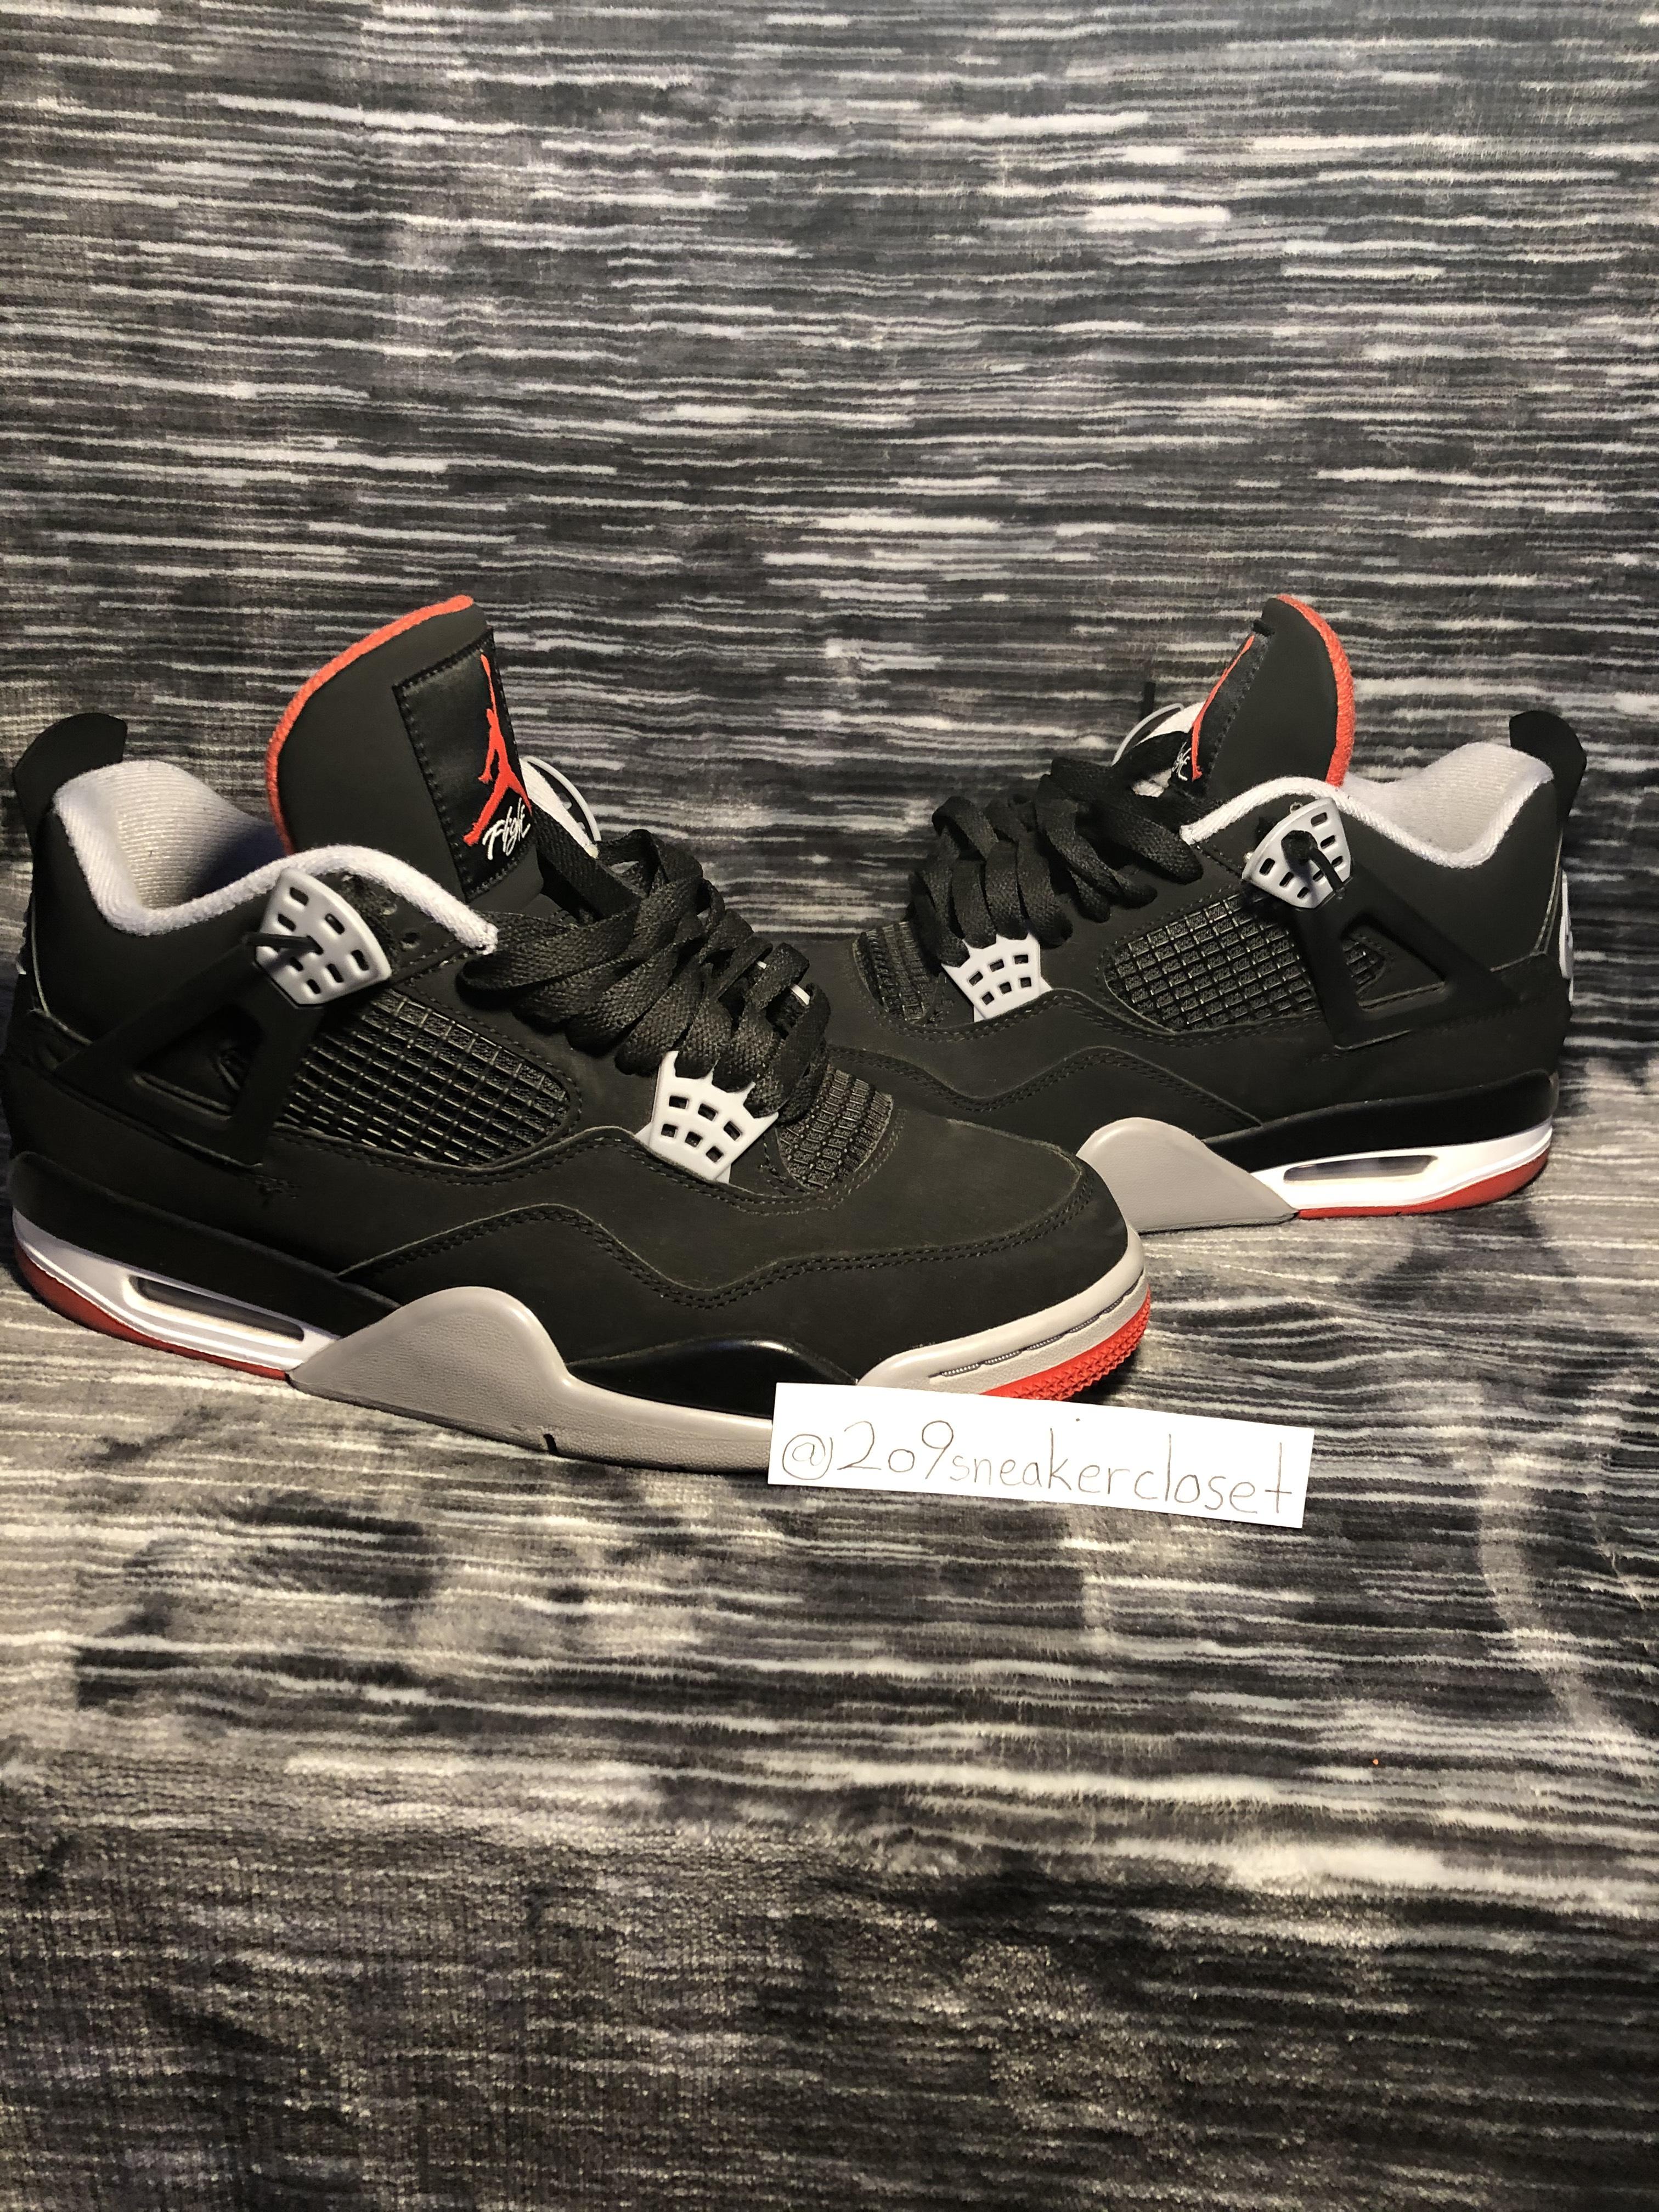 Air Jordan - $300 - Size 8